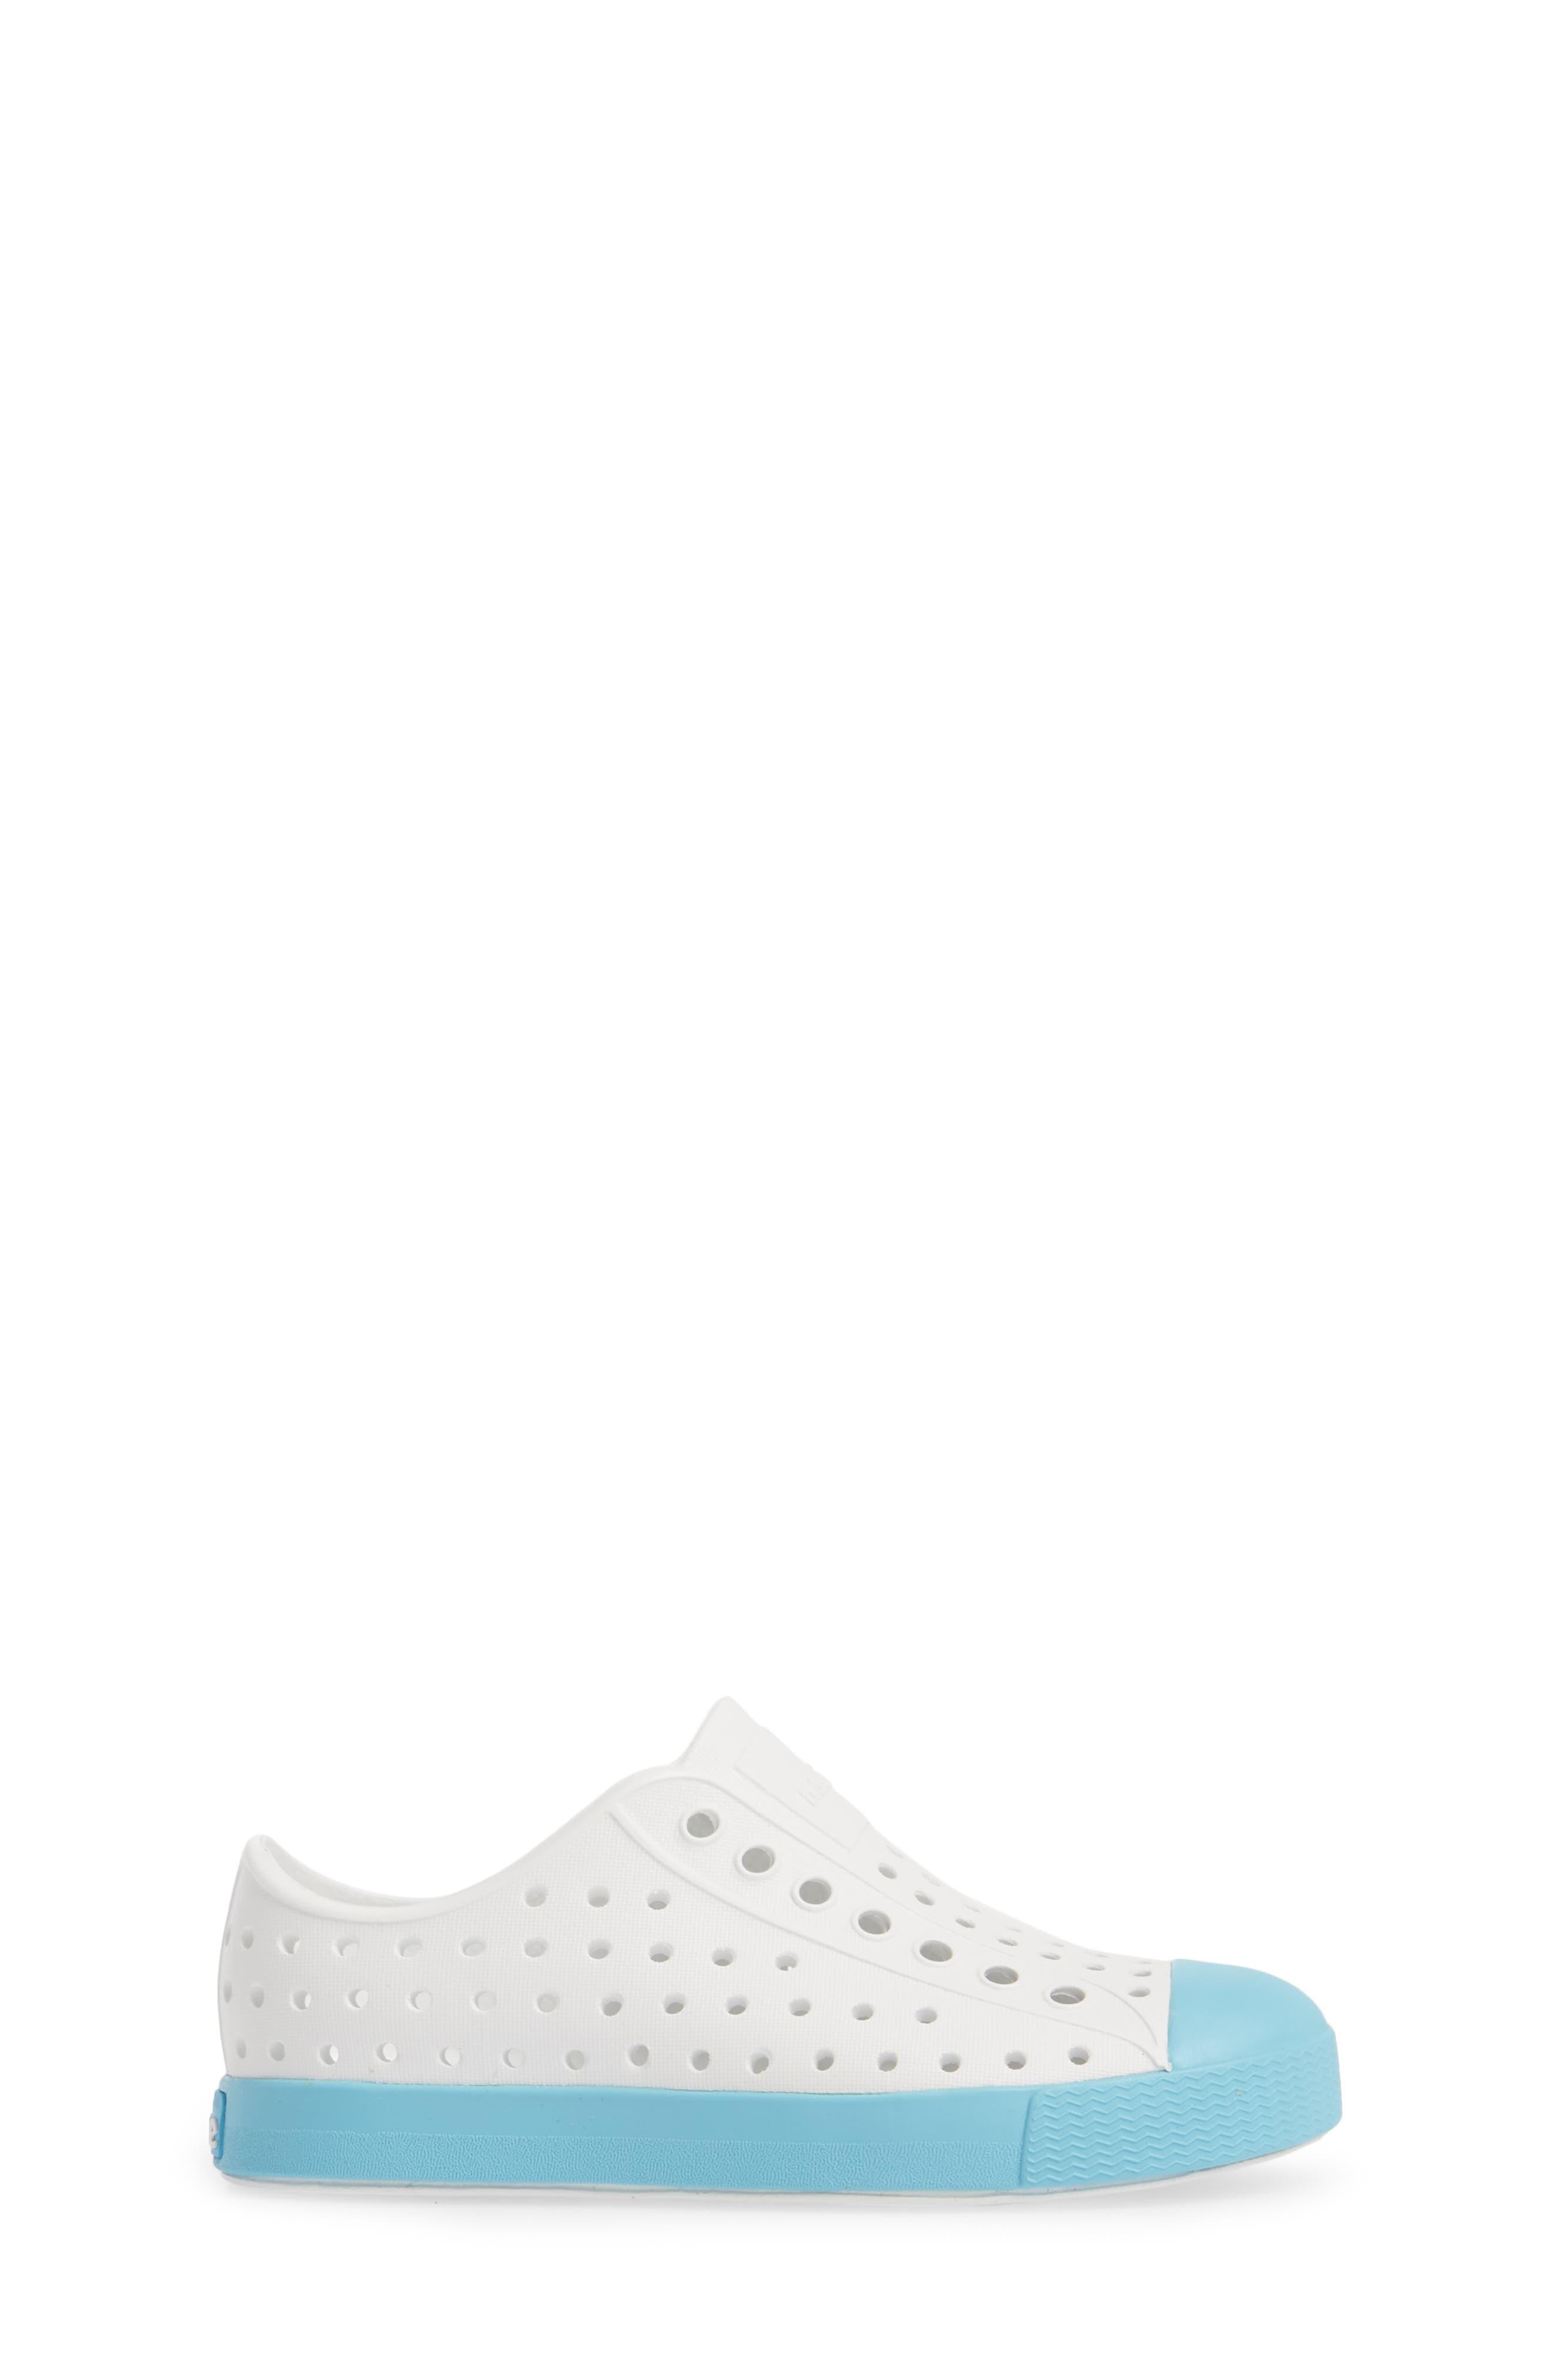 'Jefferson' Water Friendly Slip-On Sneaker,                             Alternate thumbnail 125, color,